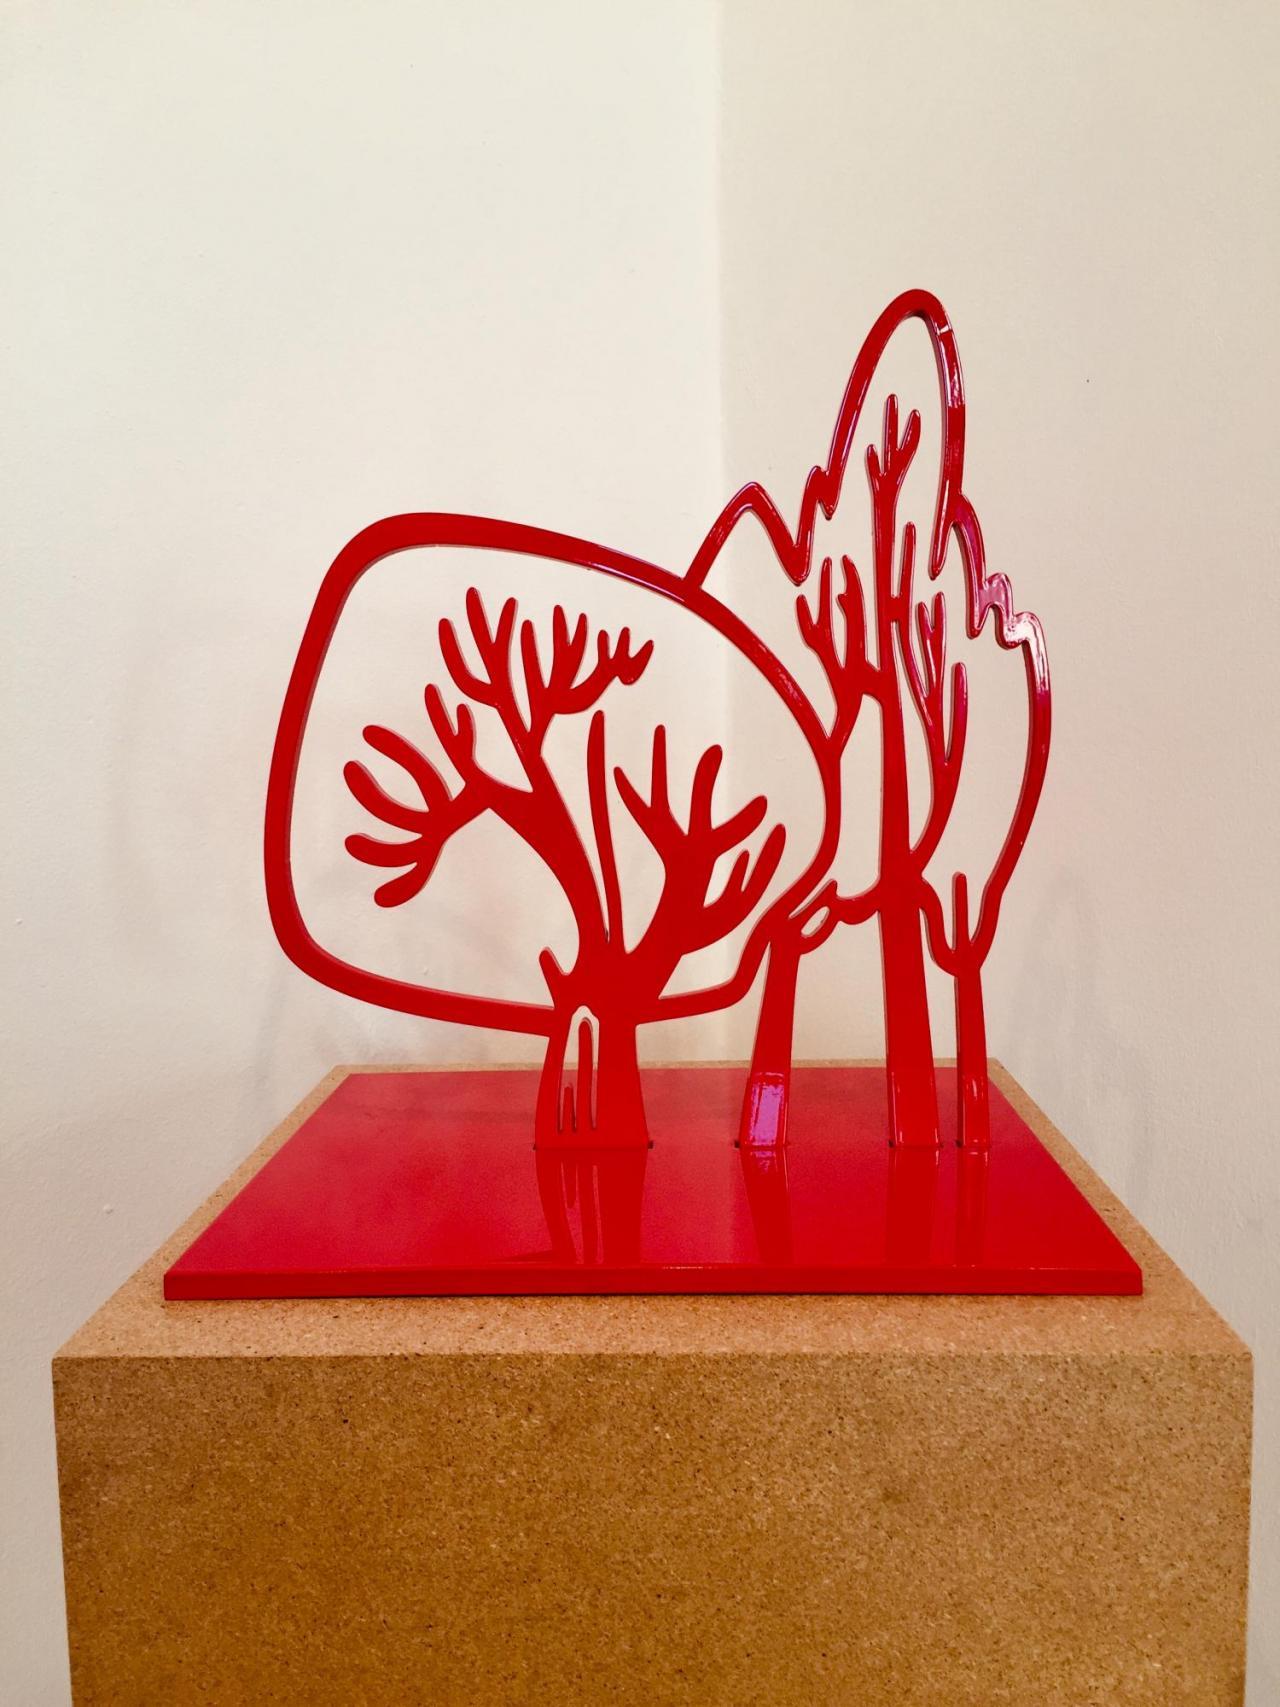 Morrison Copse, 2019, Steel, lacquered, 40 x 35,5 x 30 cm, Copyright Galerie Sabine Knust